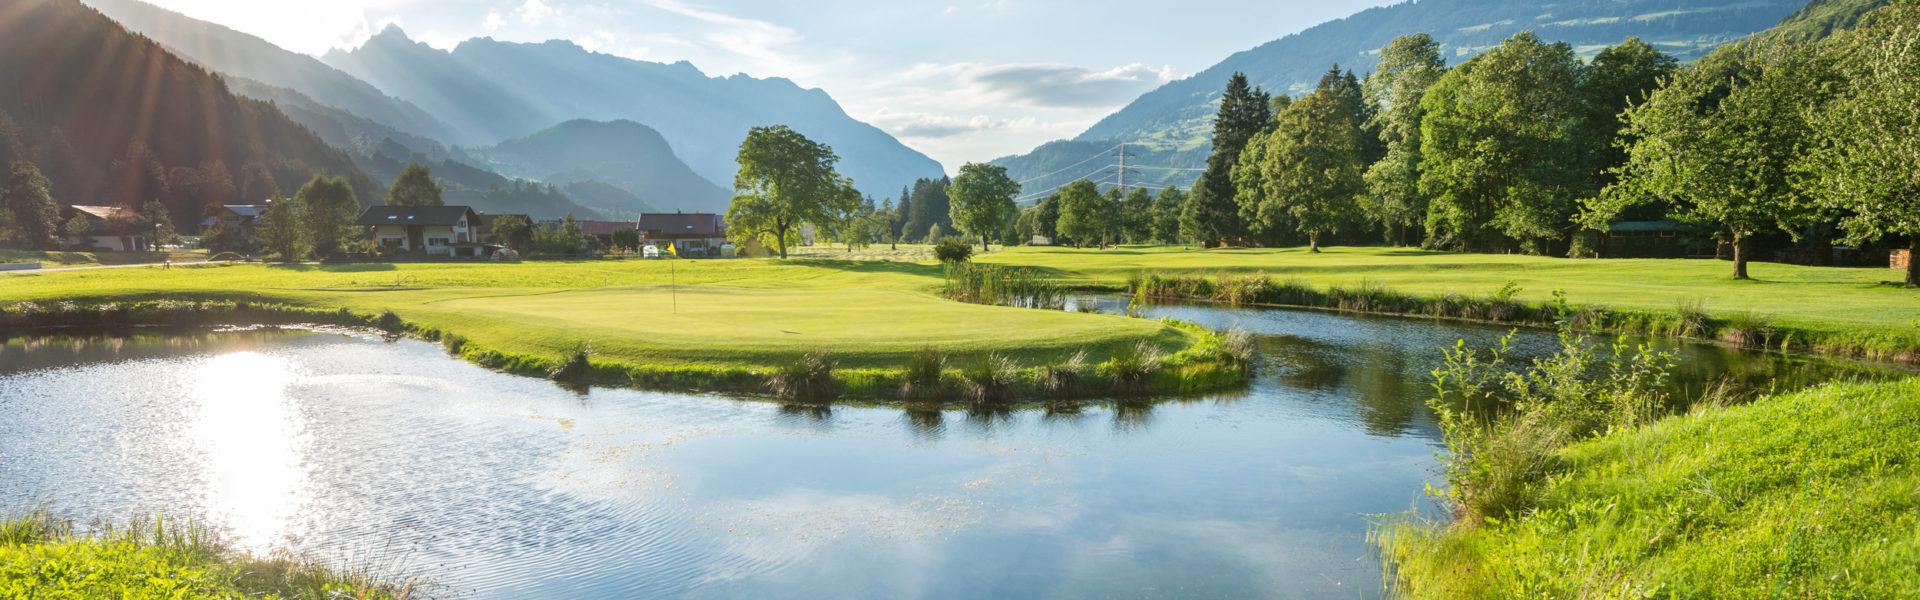 Golfclub Montafon © Matthias Rhomberg / Vorarlberg Tourismus